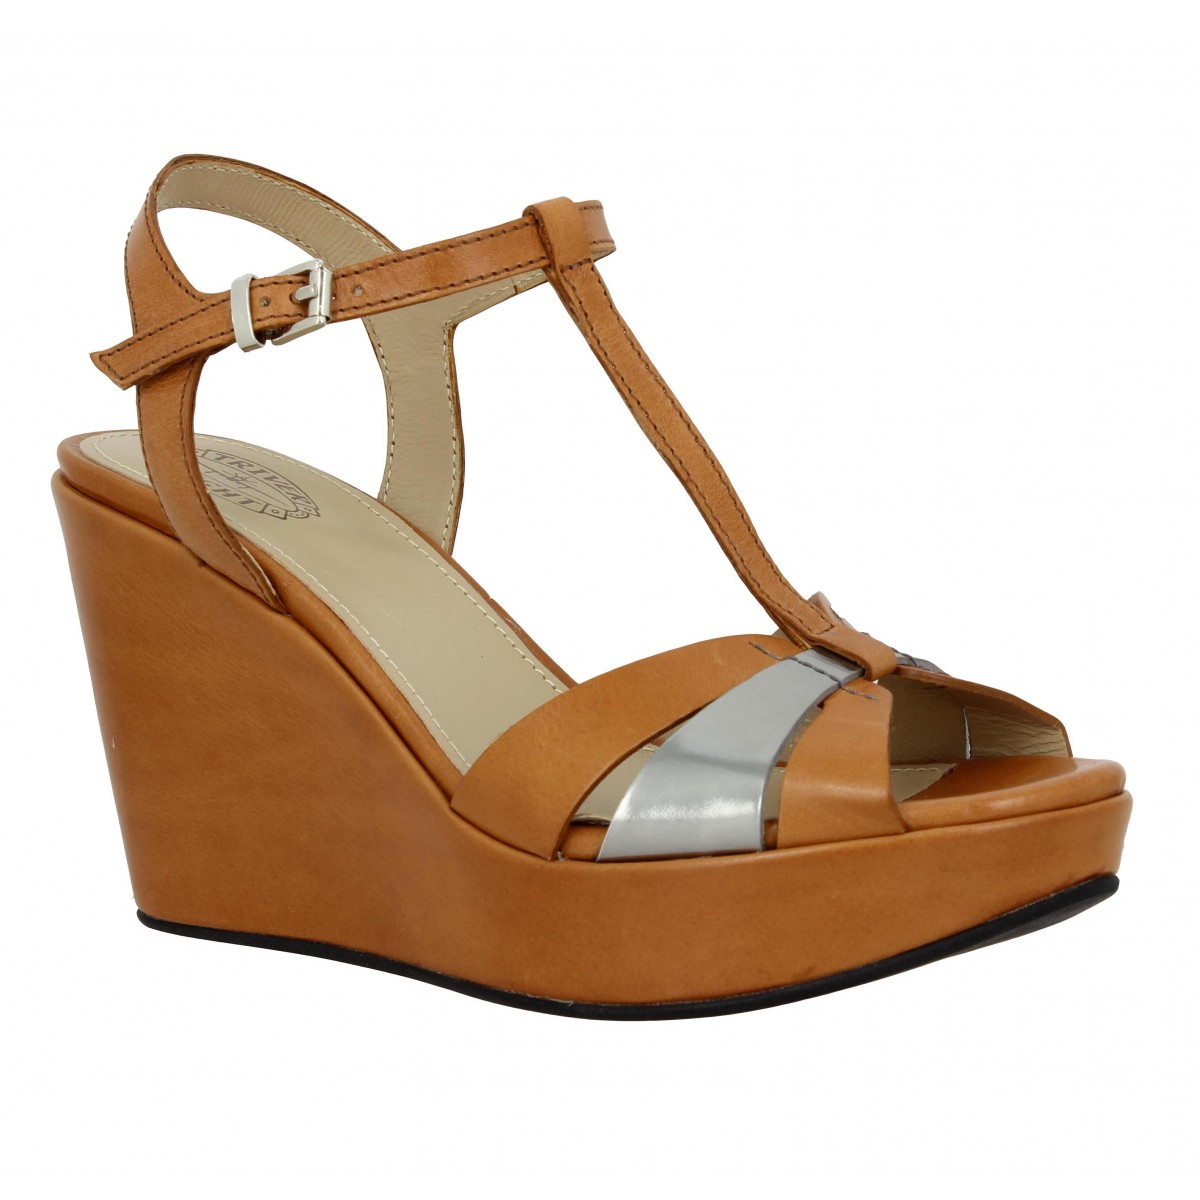 cb5f6c0f84d0a chaussure compense italienne